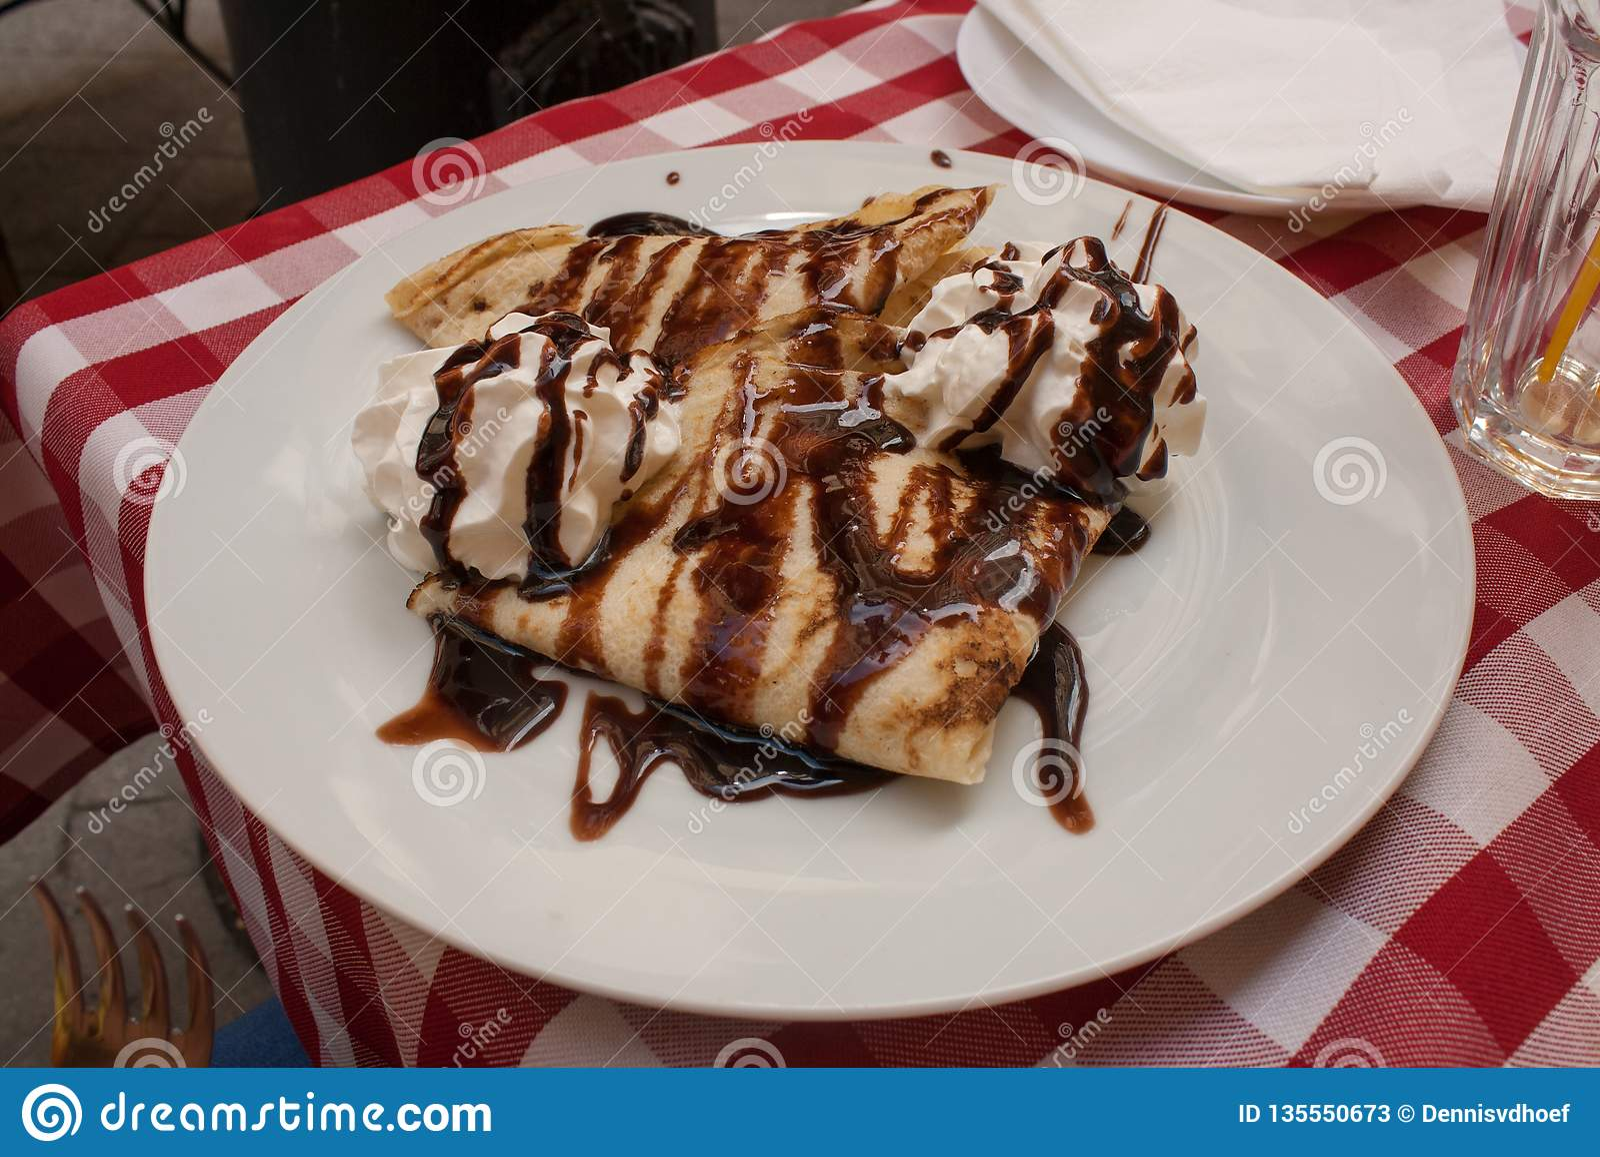 Hungarian pancakes.